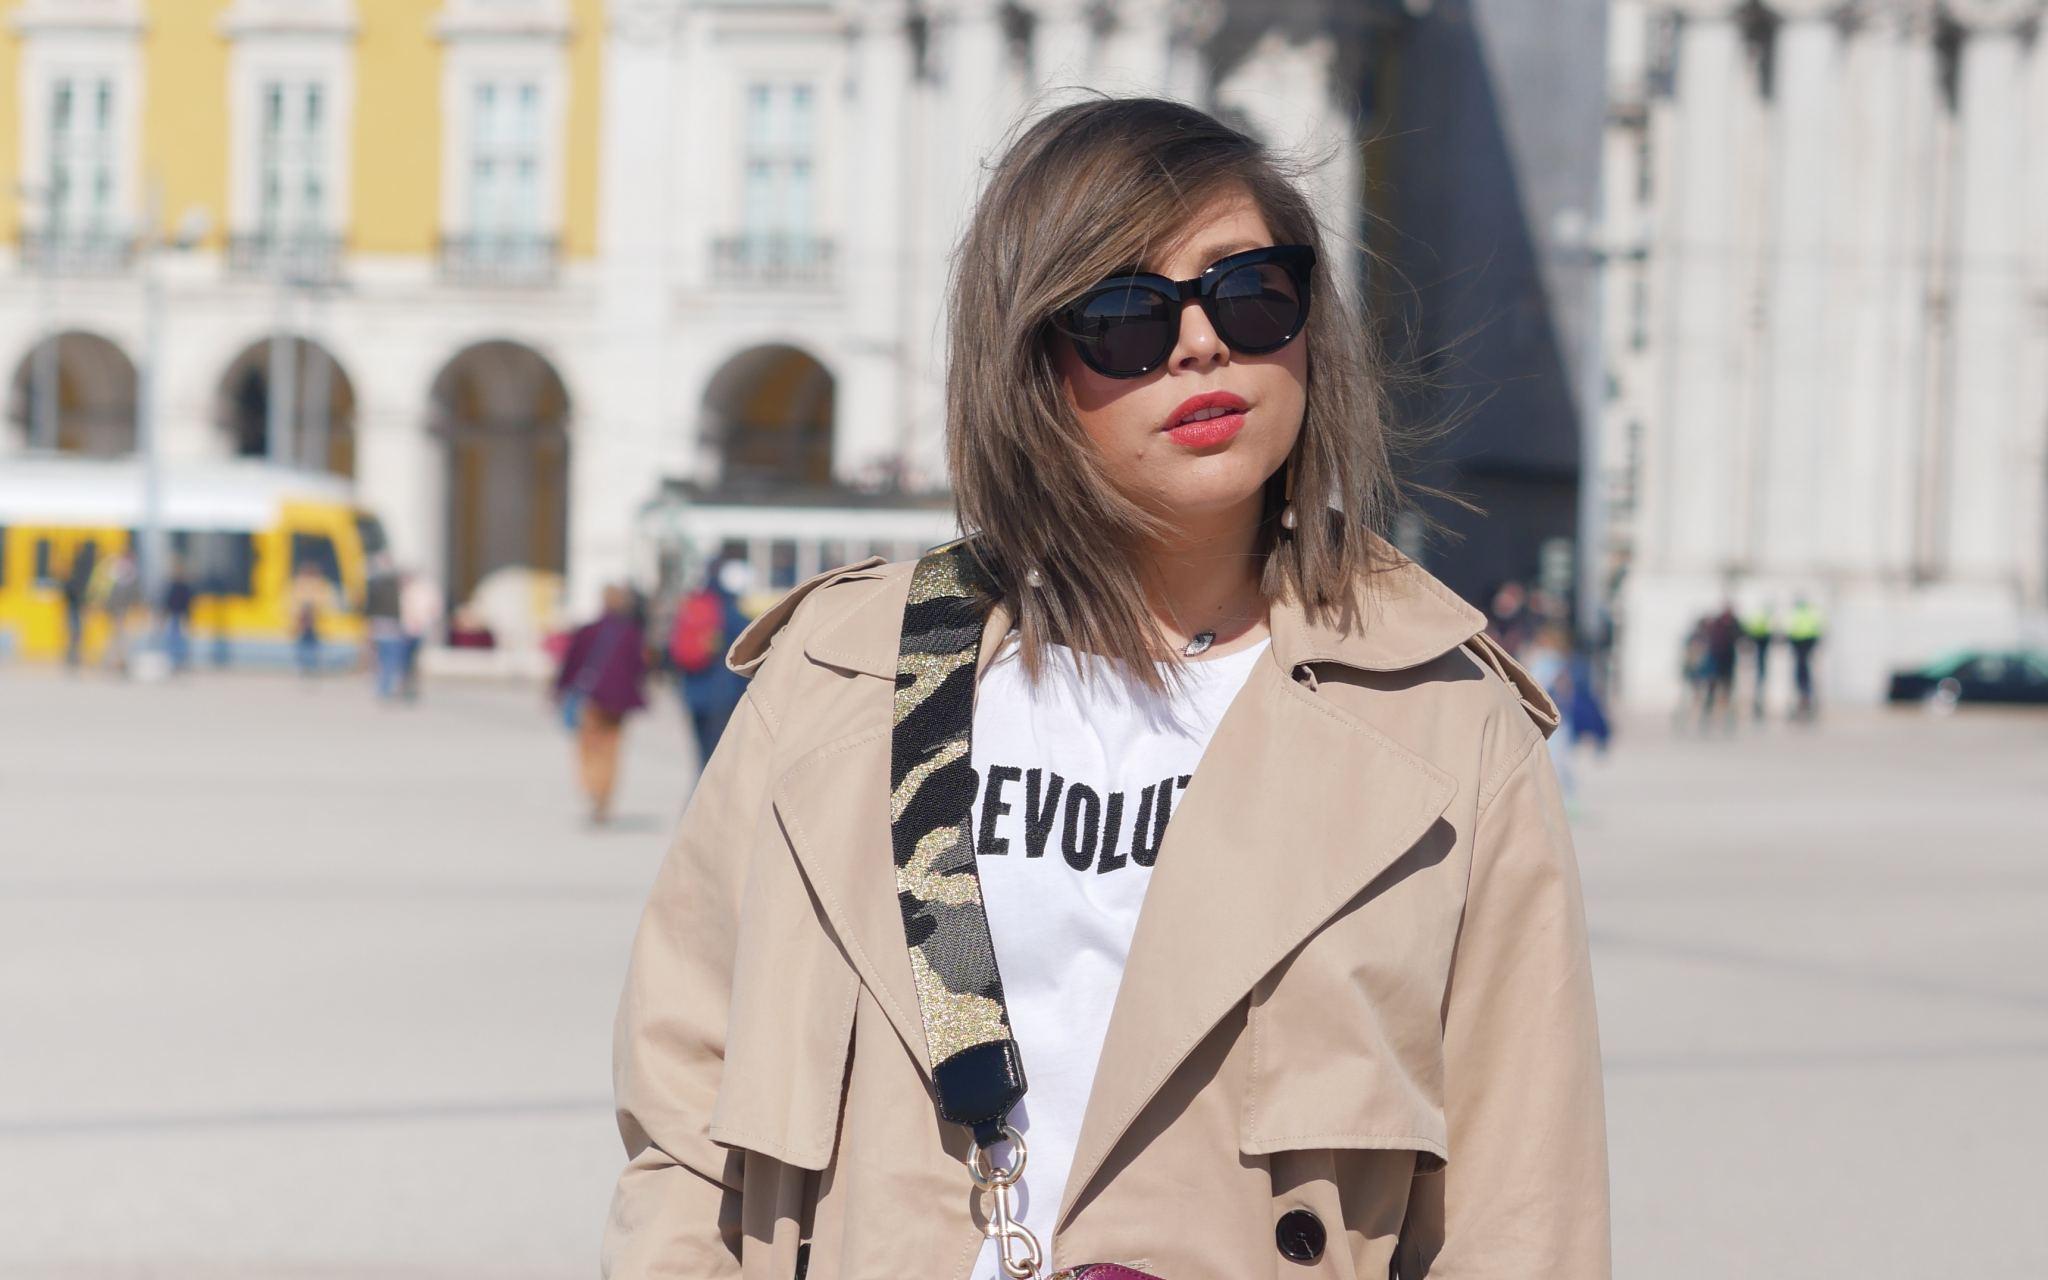 manchester fashion blogger , manchester , oversized trench , marc jacobs bag, manchester fashion bloggers